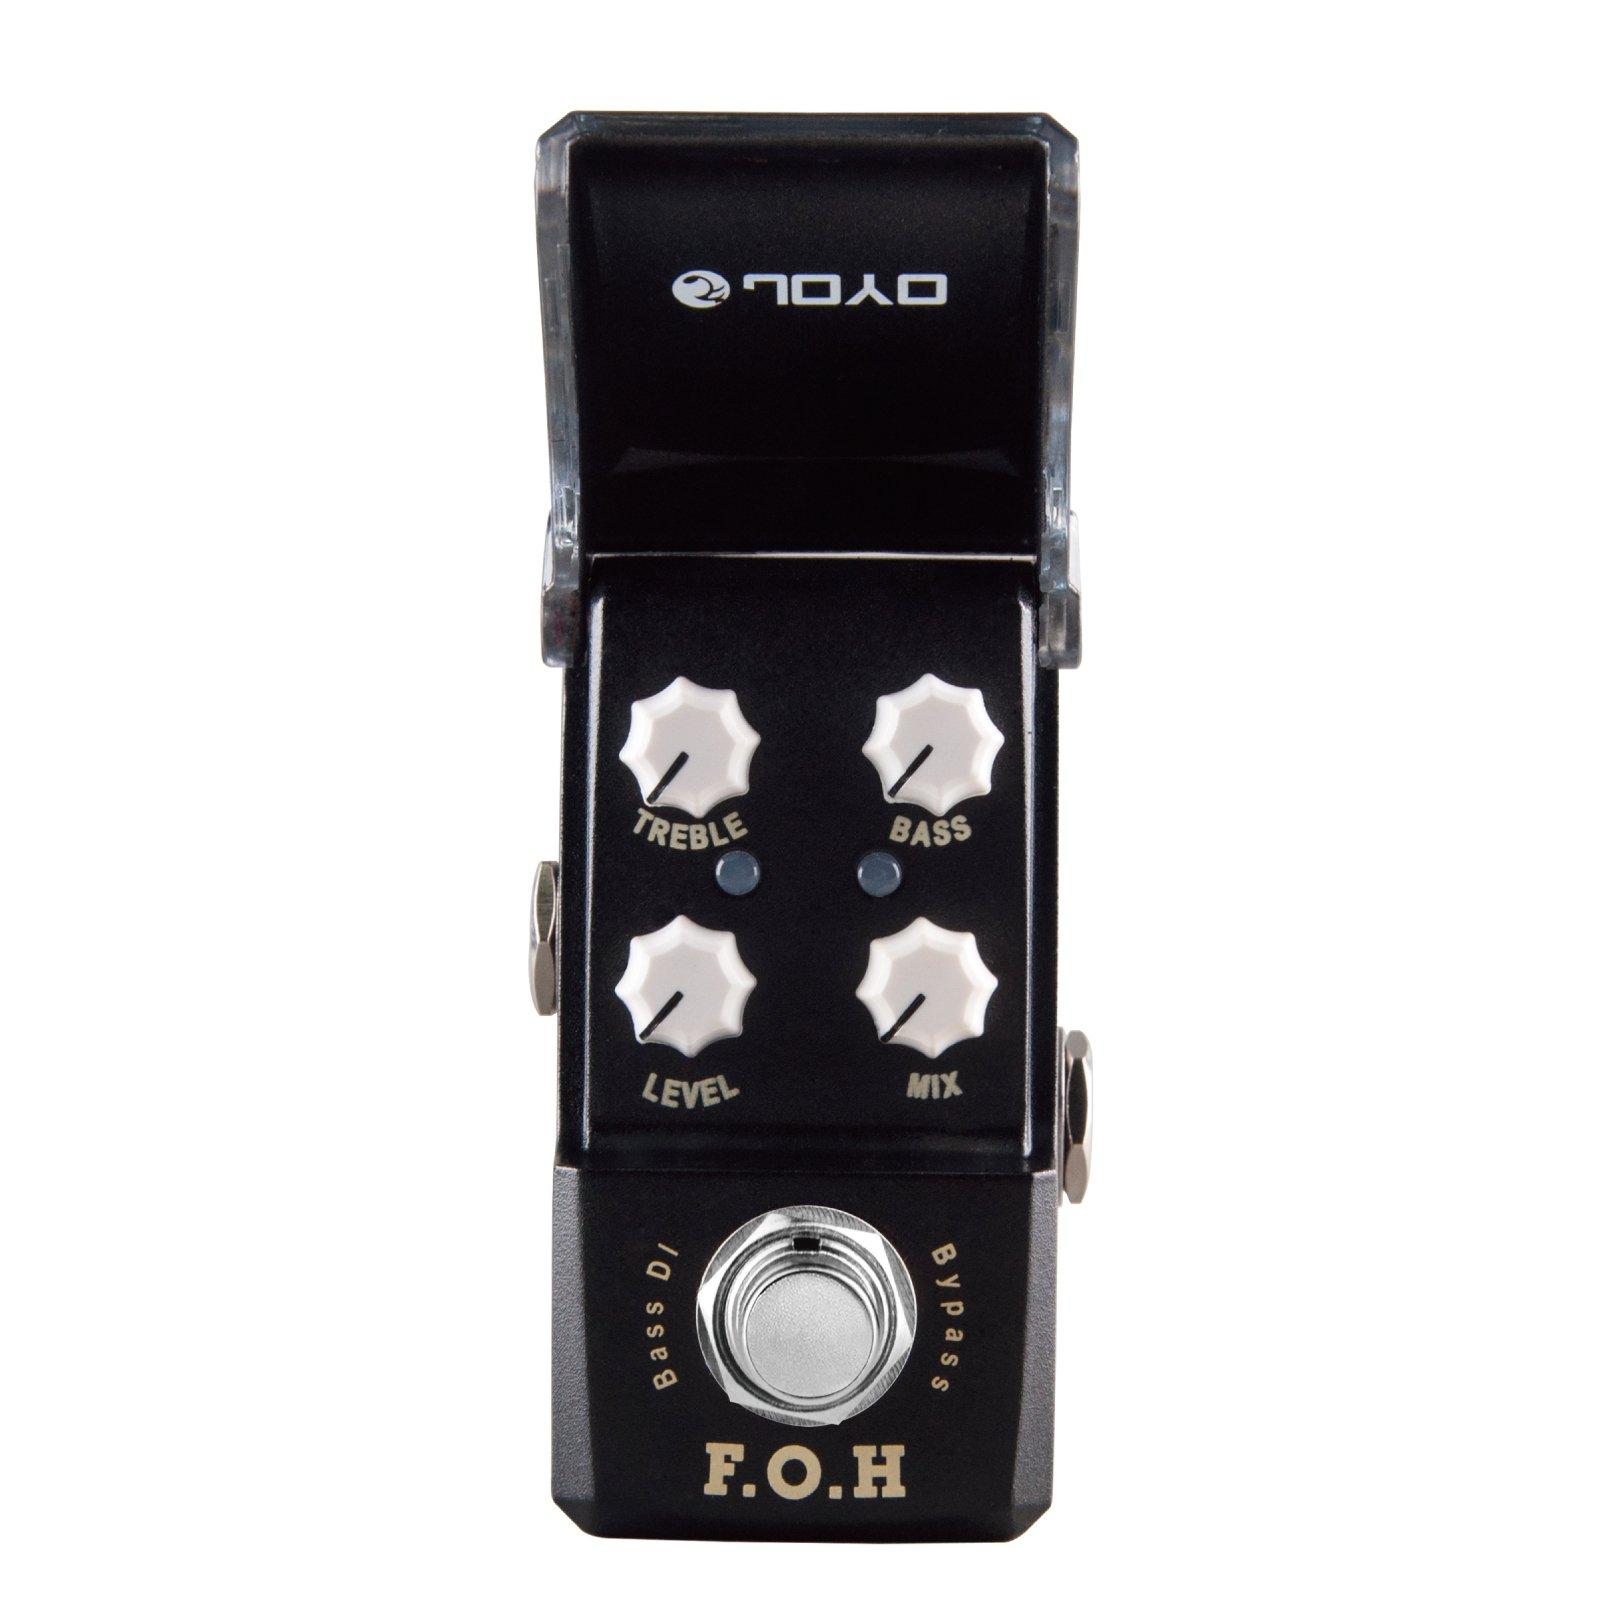 Joyo JF-331 F.O.H. Bass DI/EQ Pedal